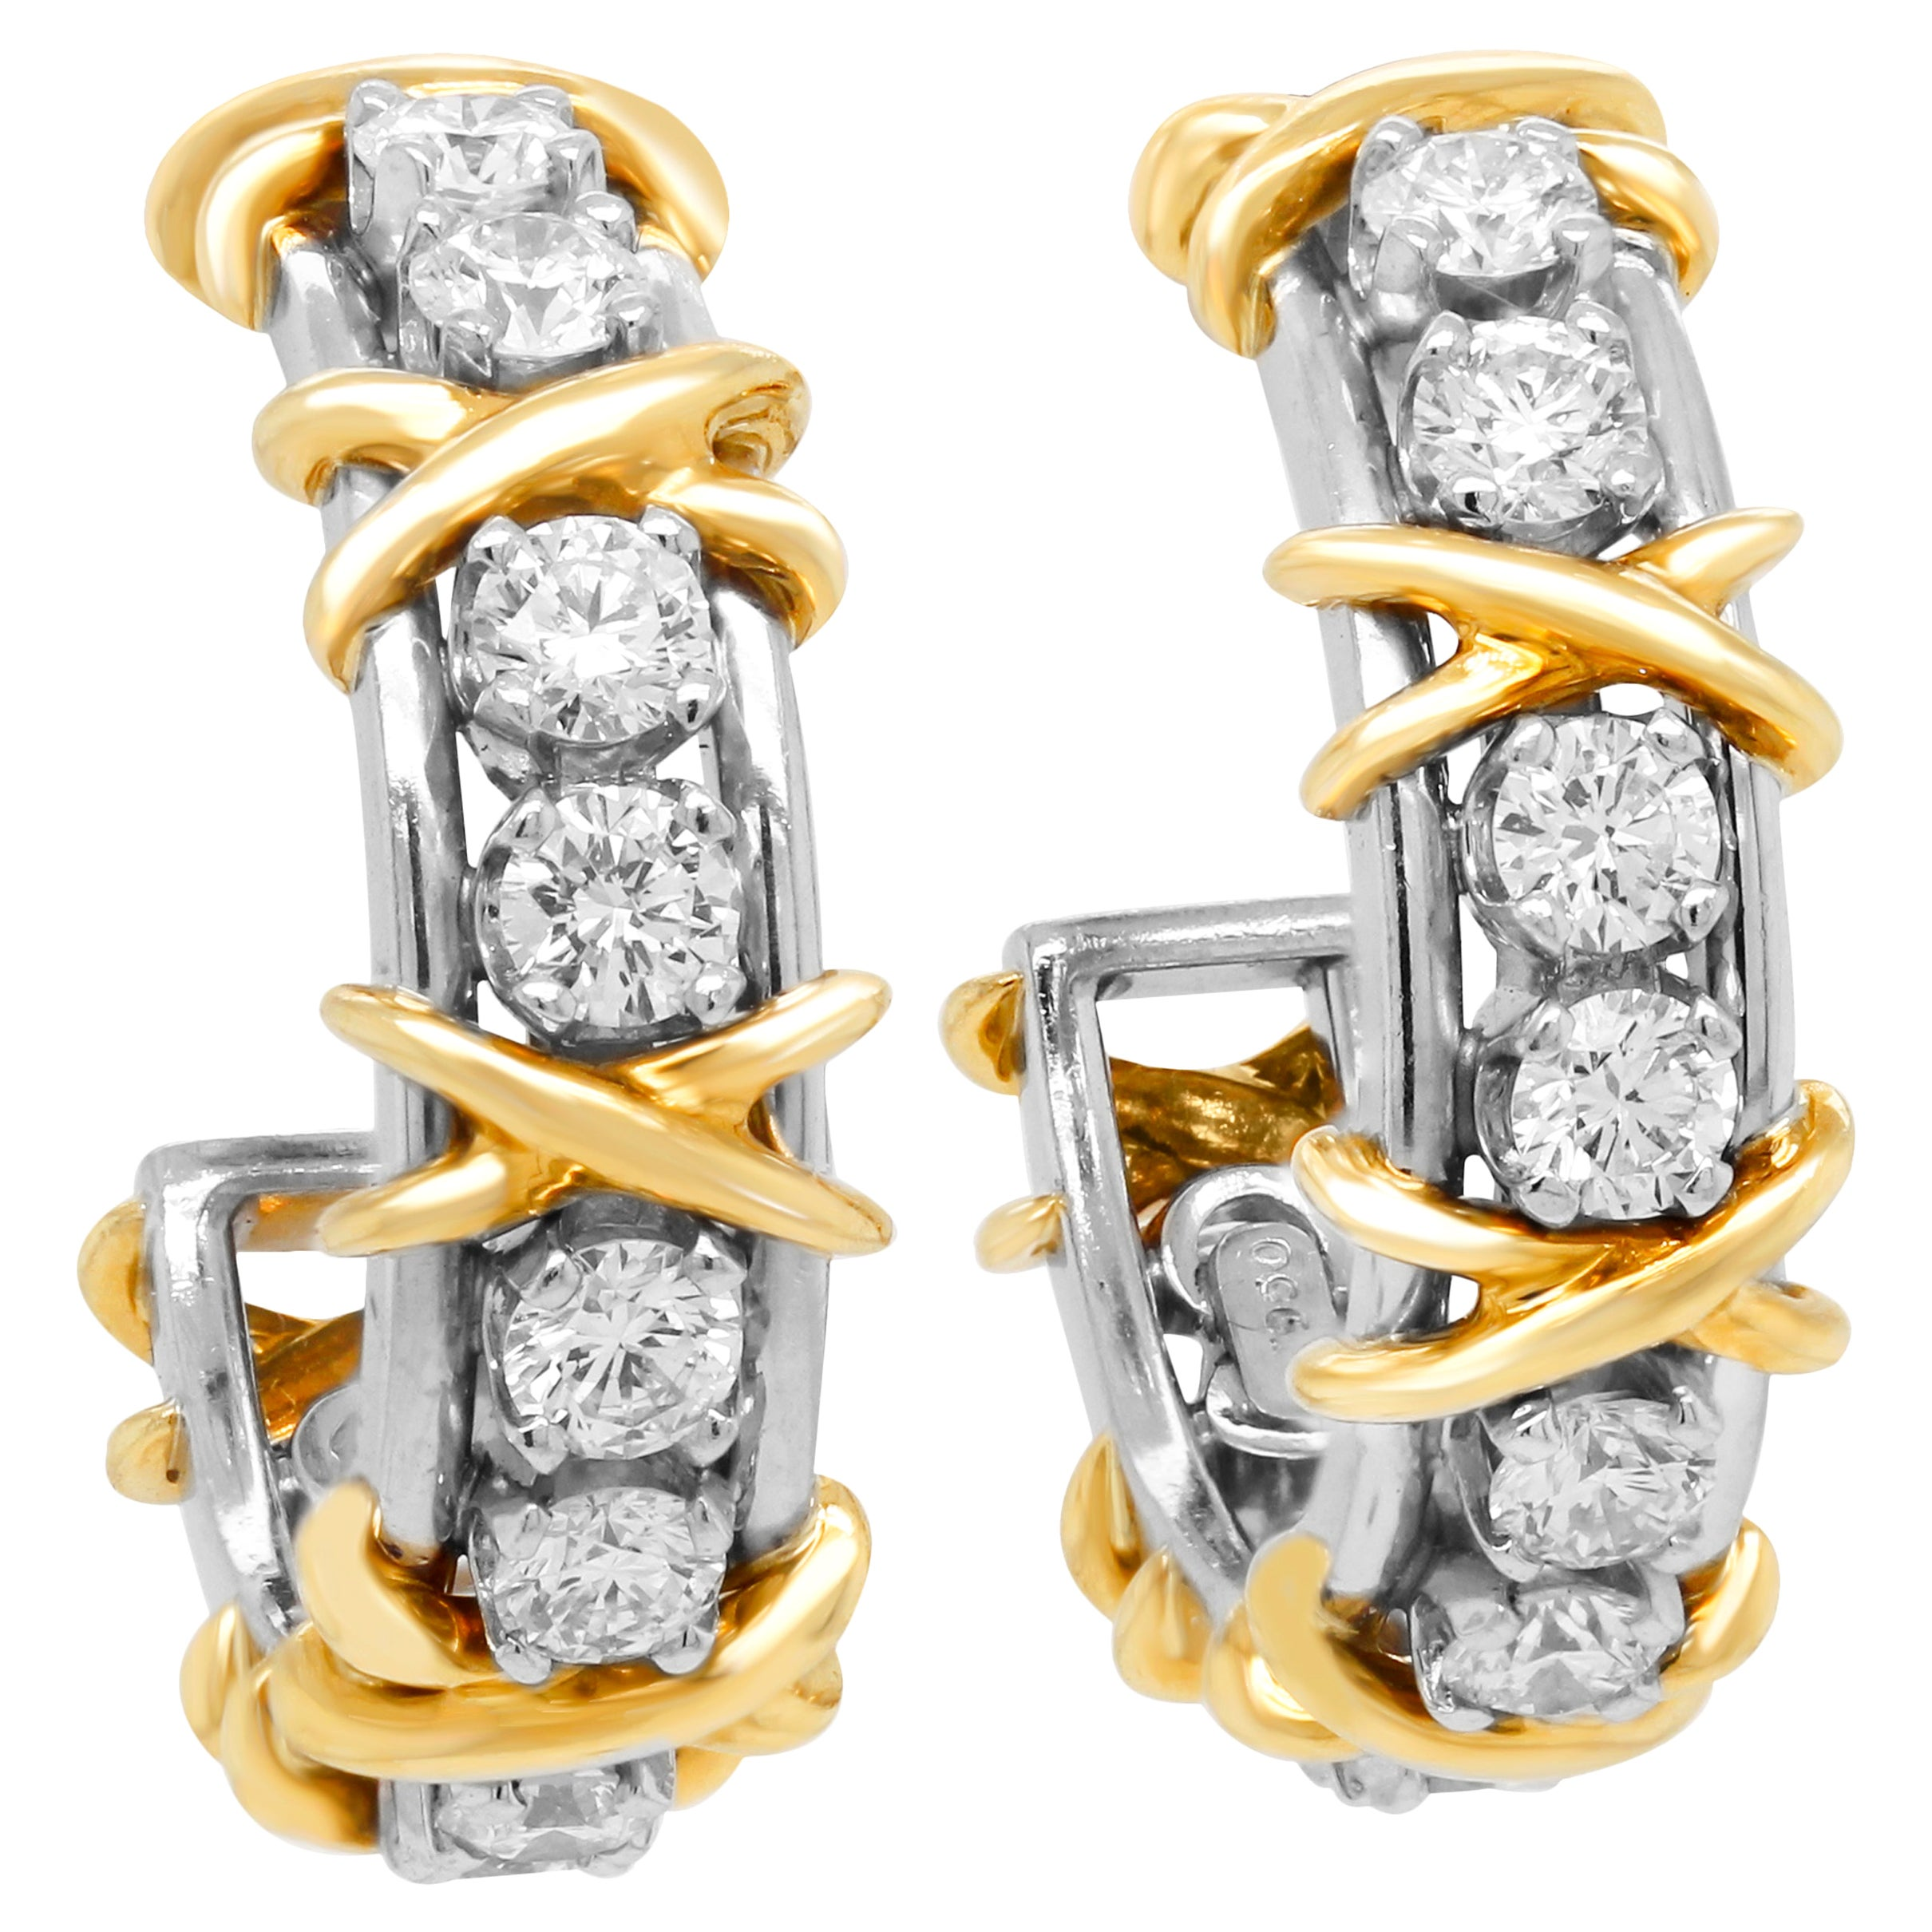 Tiffany & Co. Jean Schlumberger 18 Karat Gold Platinum Diamond X Hoop Earrings